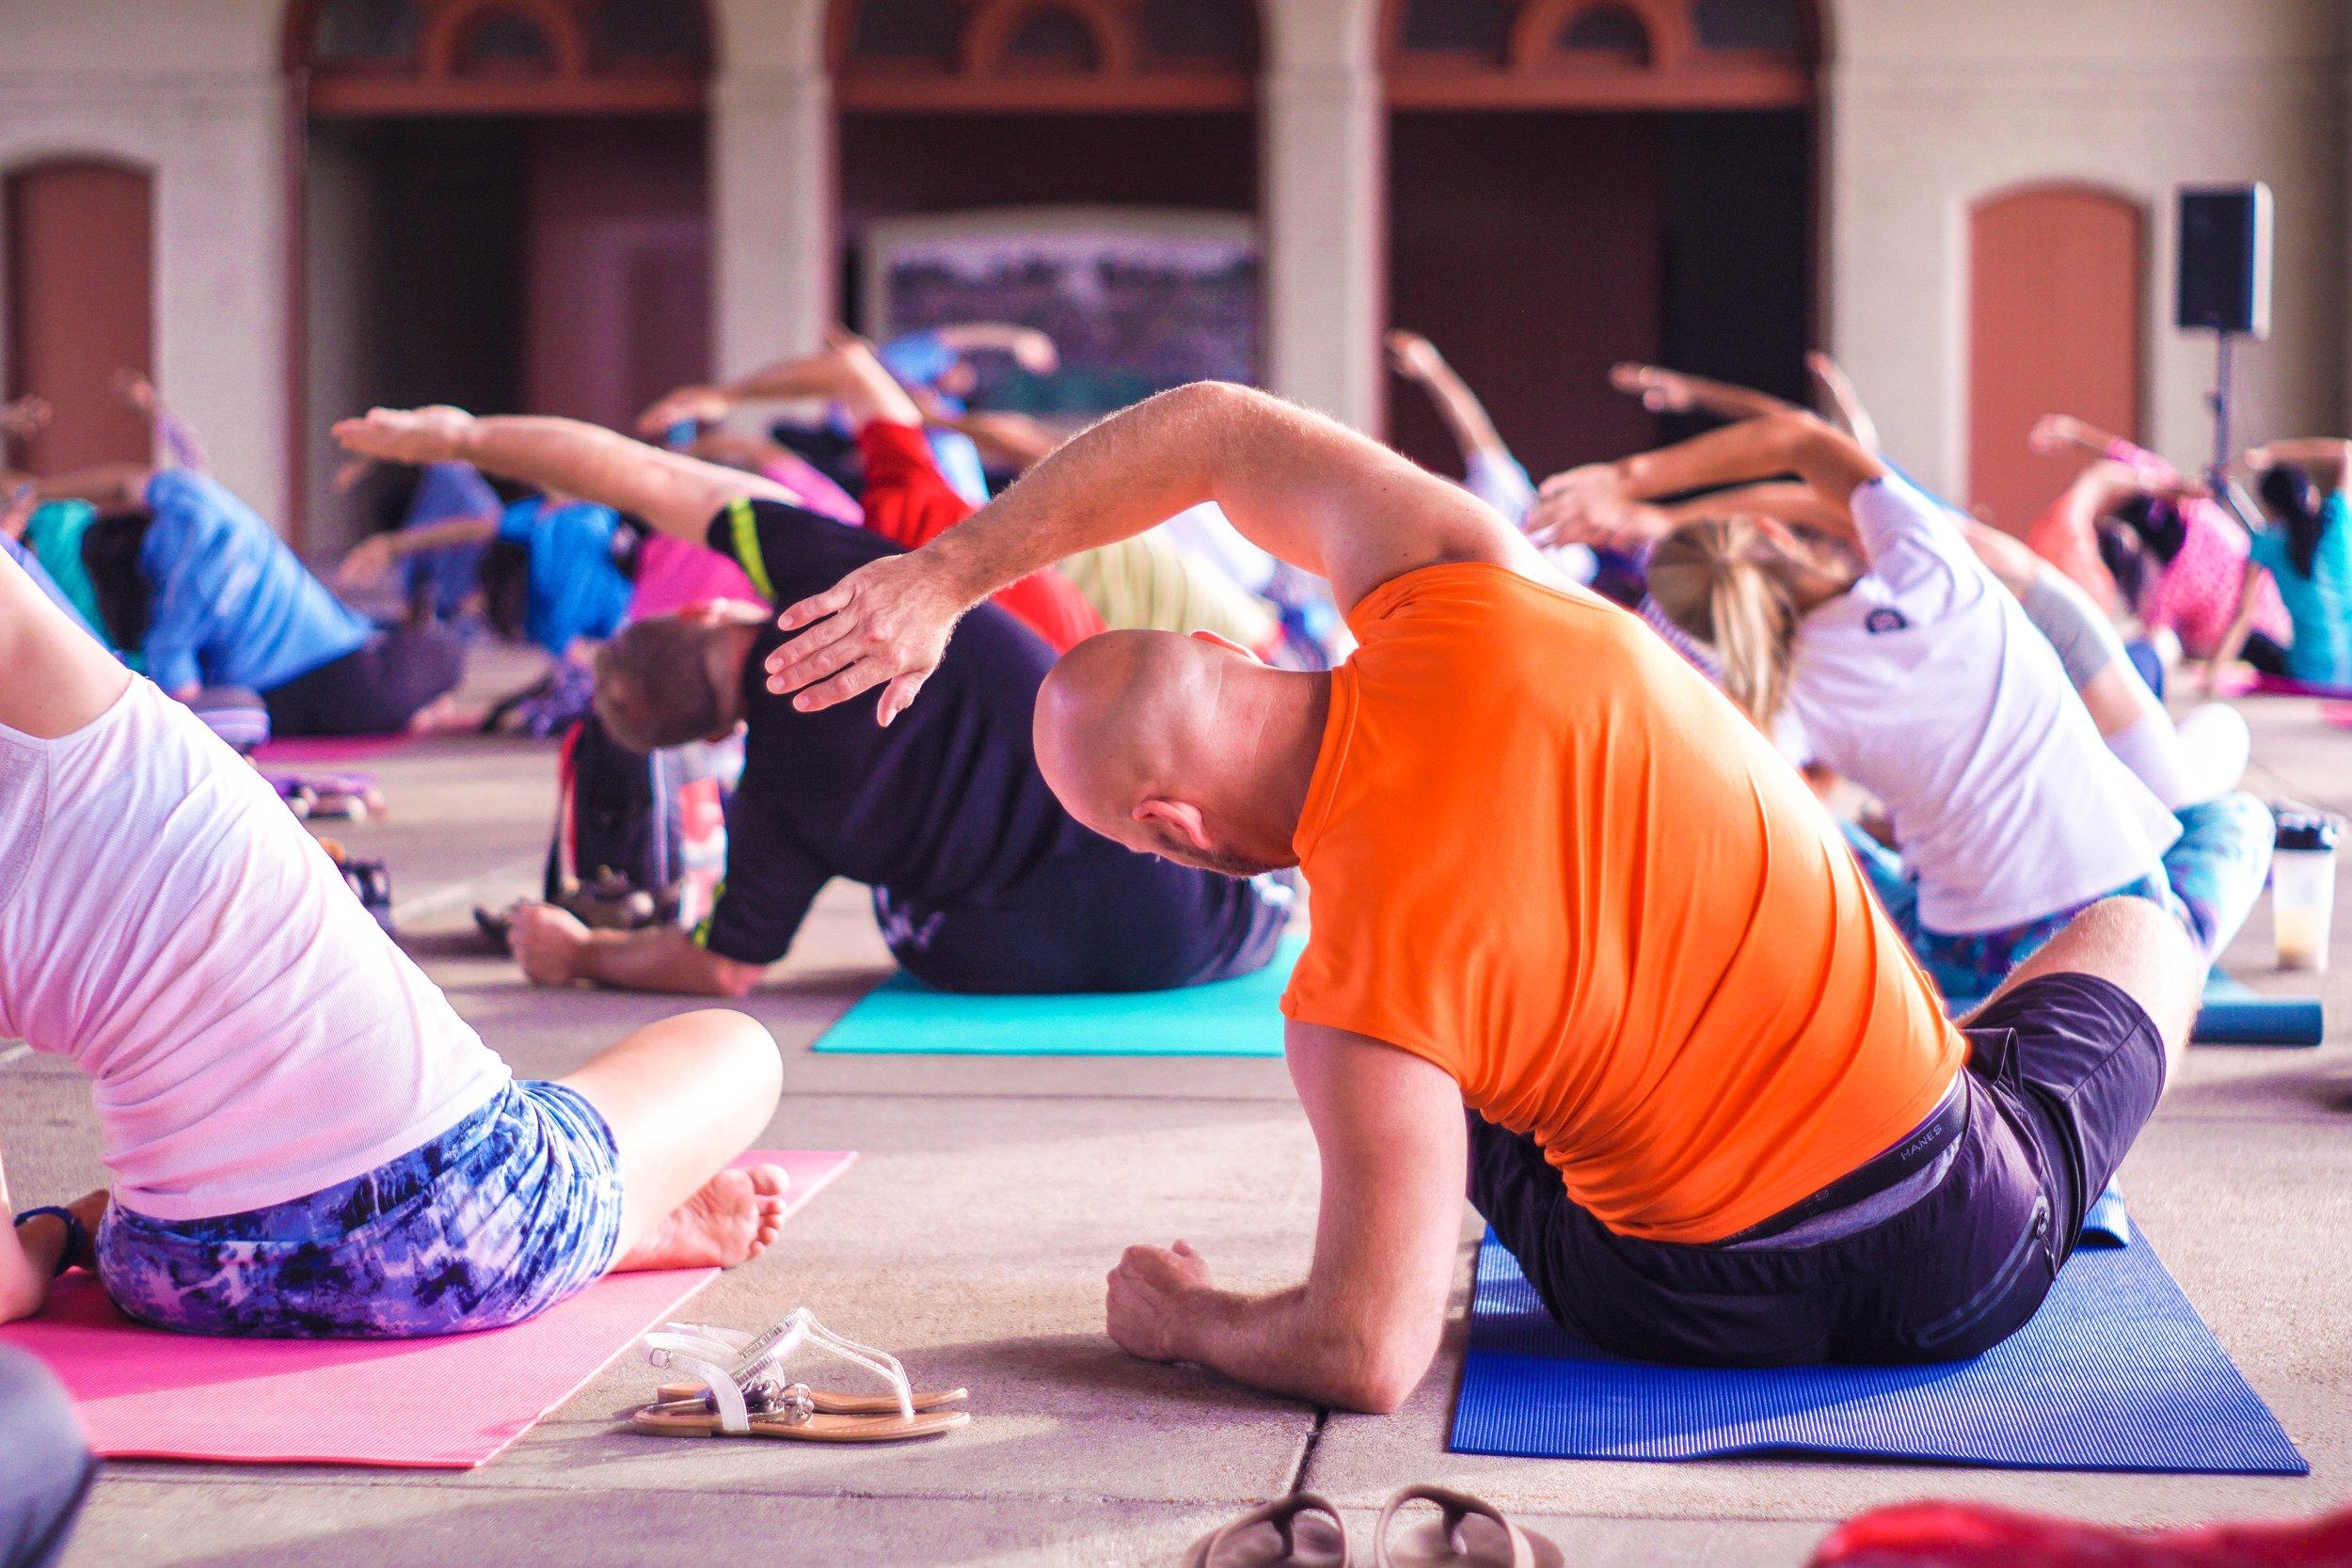 Soul Stretch - Yin Yoga - Tuesdays & Thursdays 6-7pmBeginning July 25th